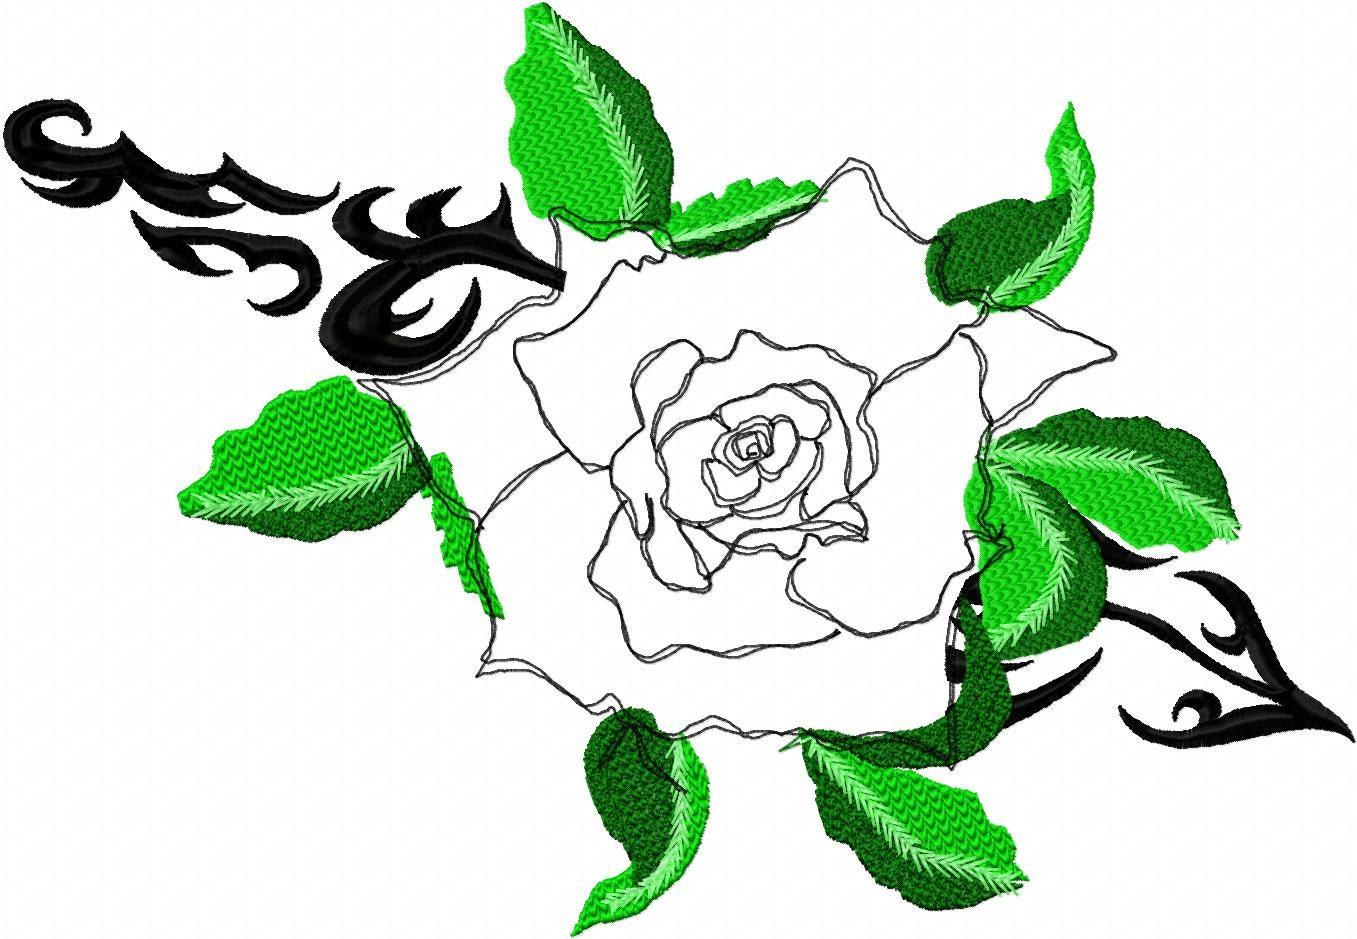 Applique rose tattoo machine embroidery design